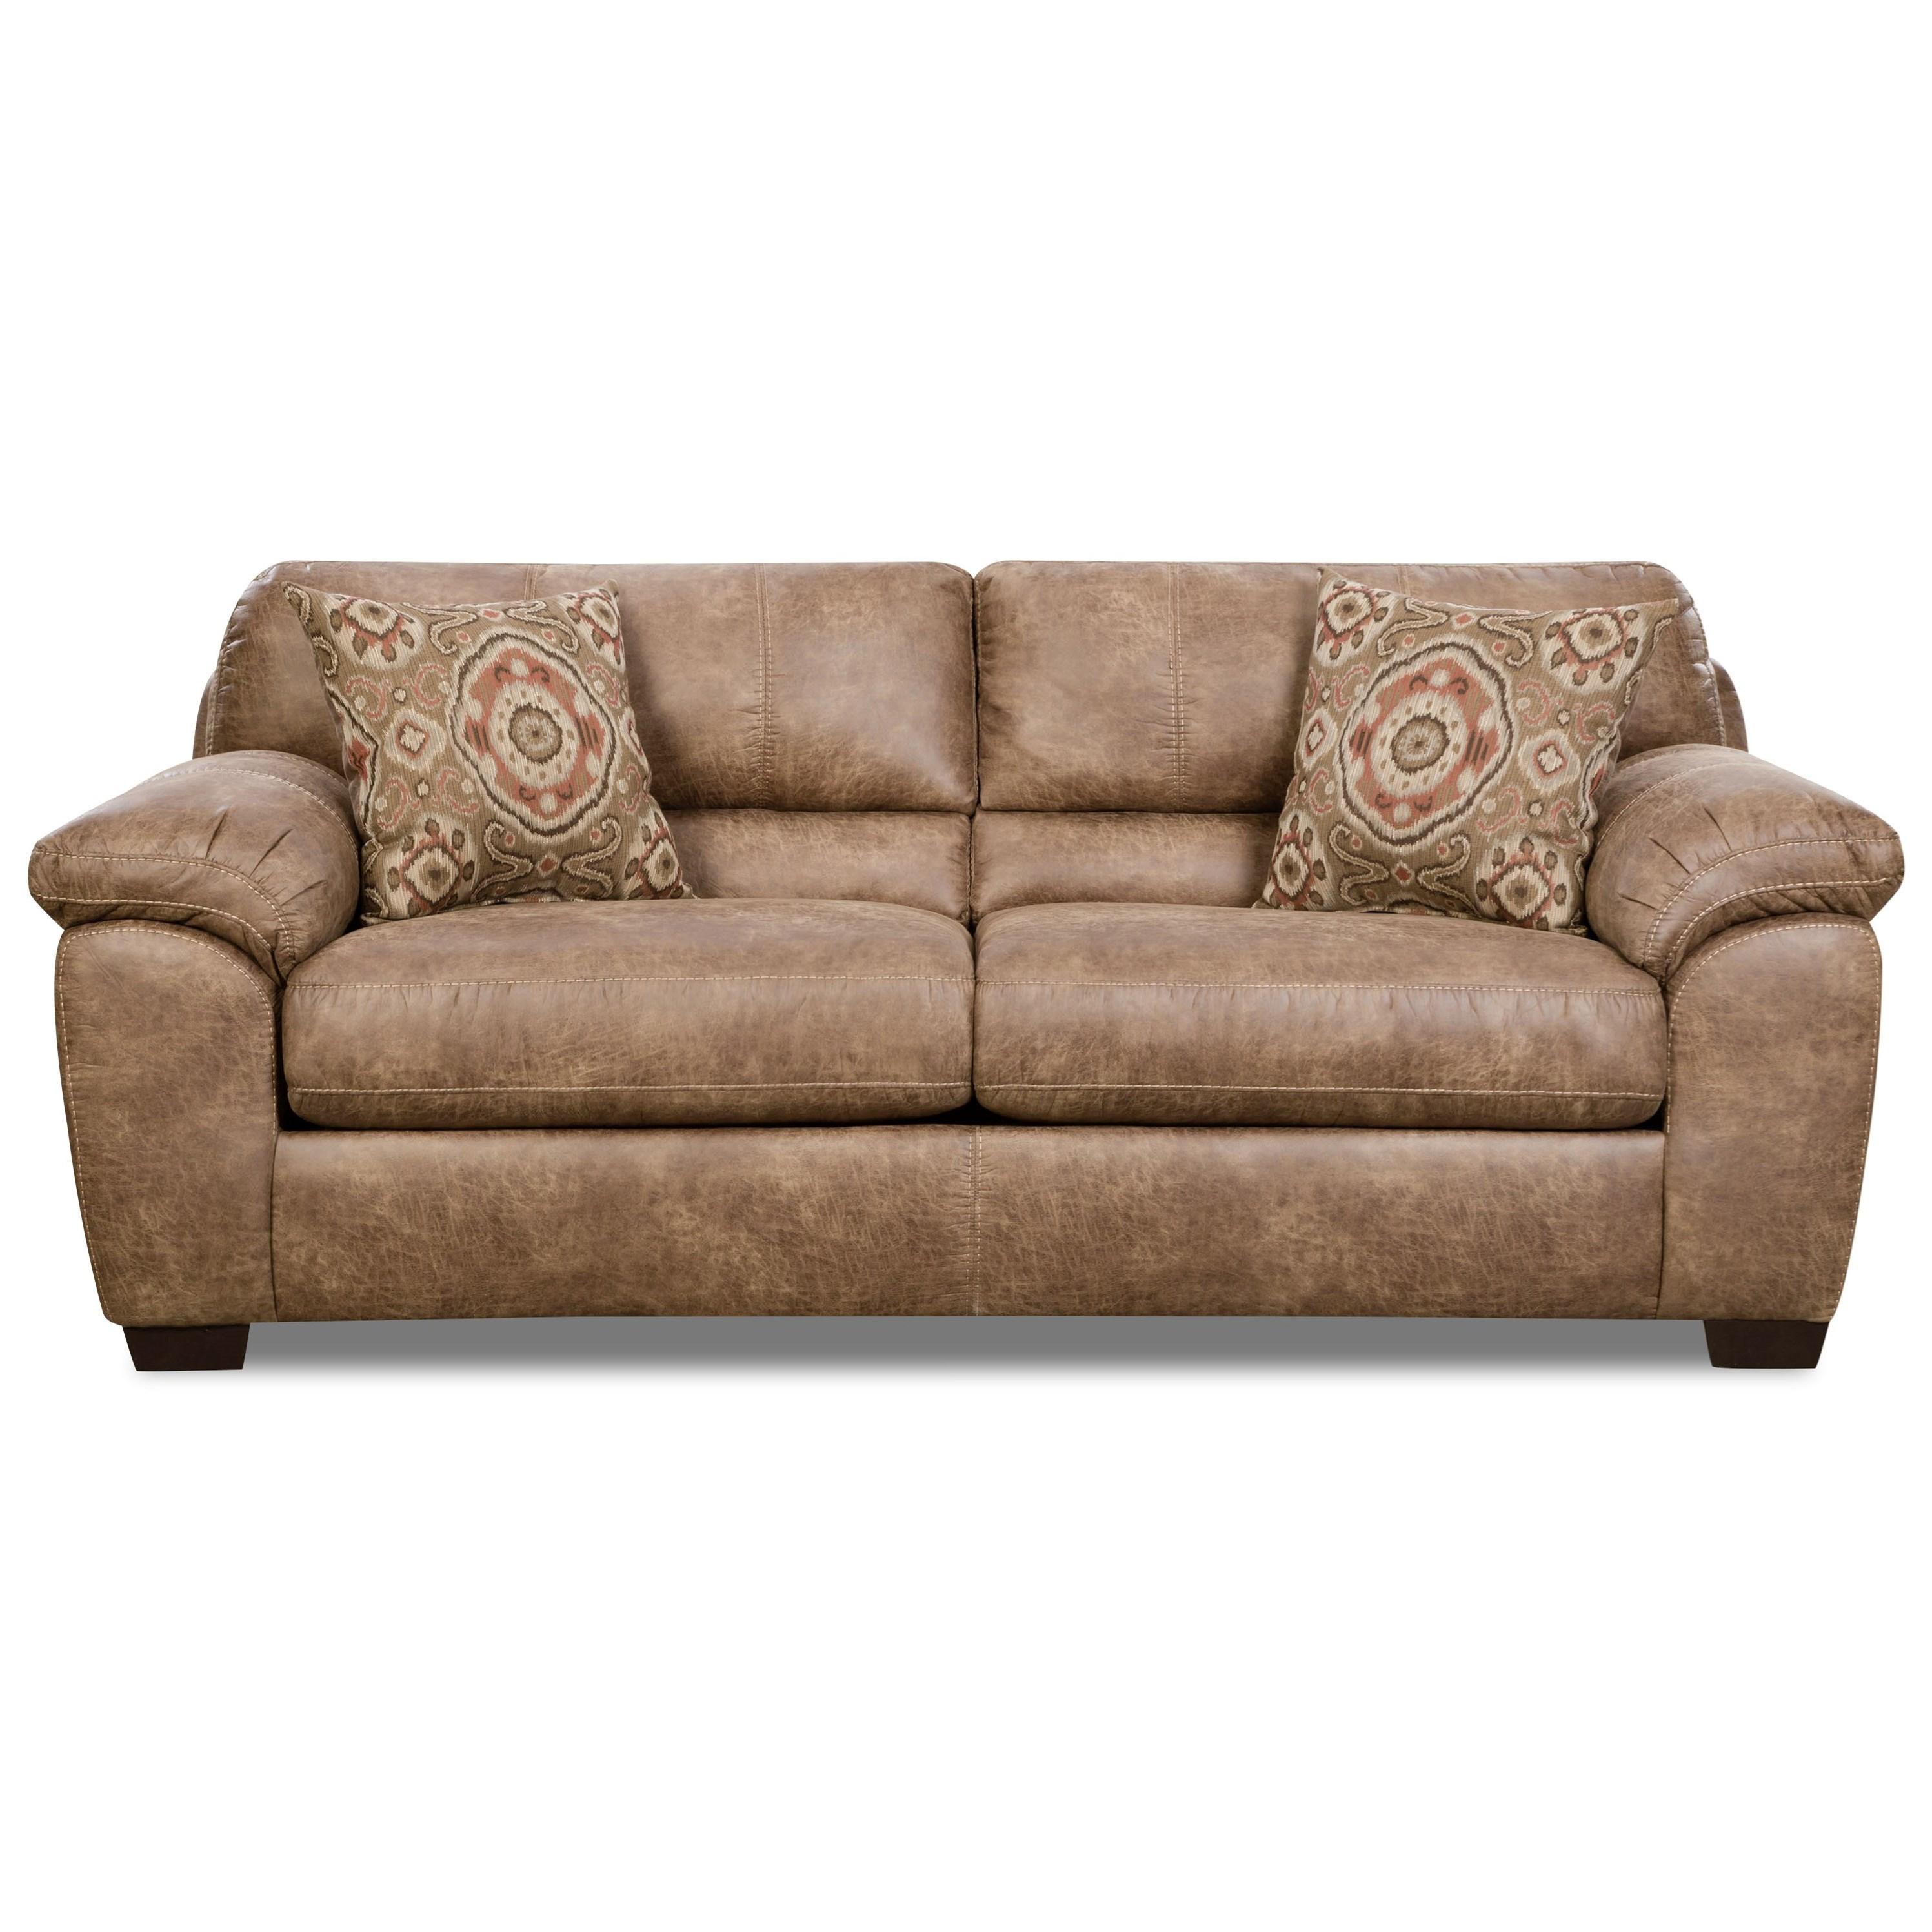 5407 Sofa by Peak Living at Prime Brothers Furniture